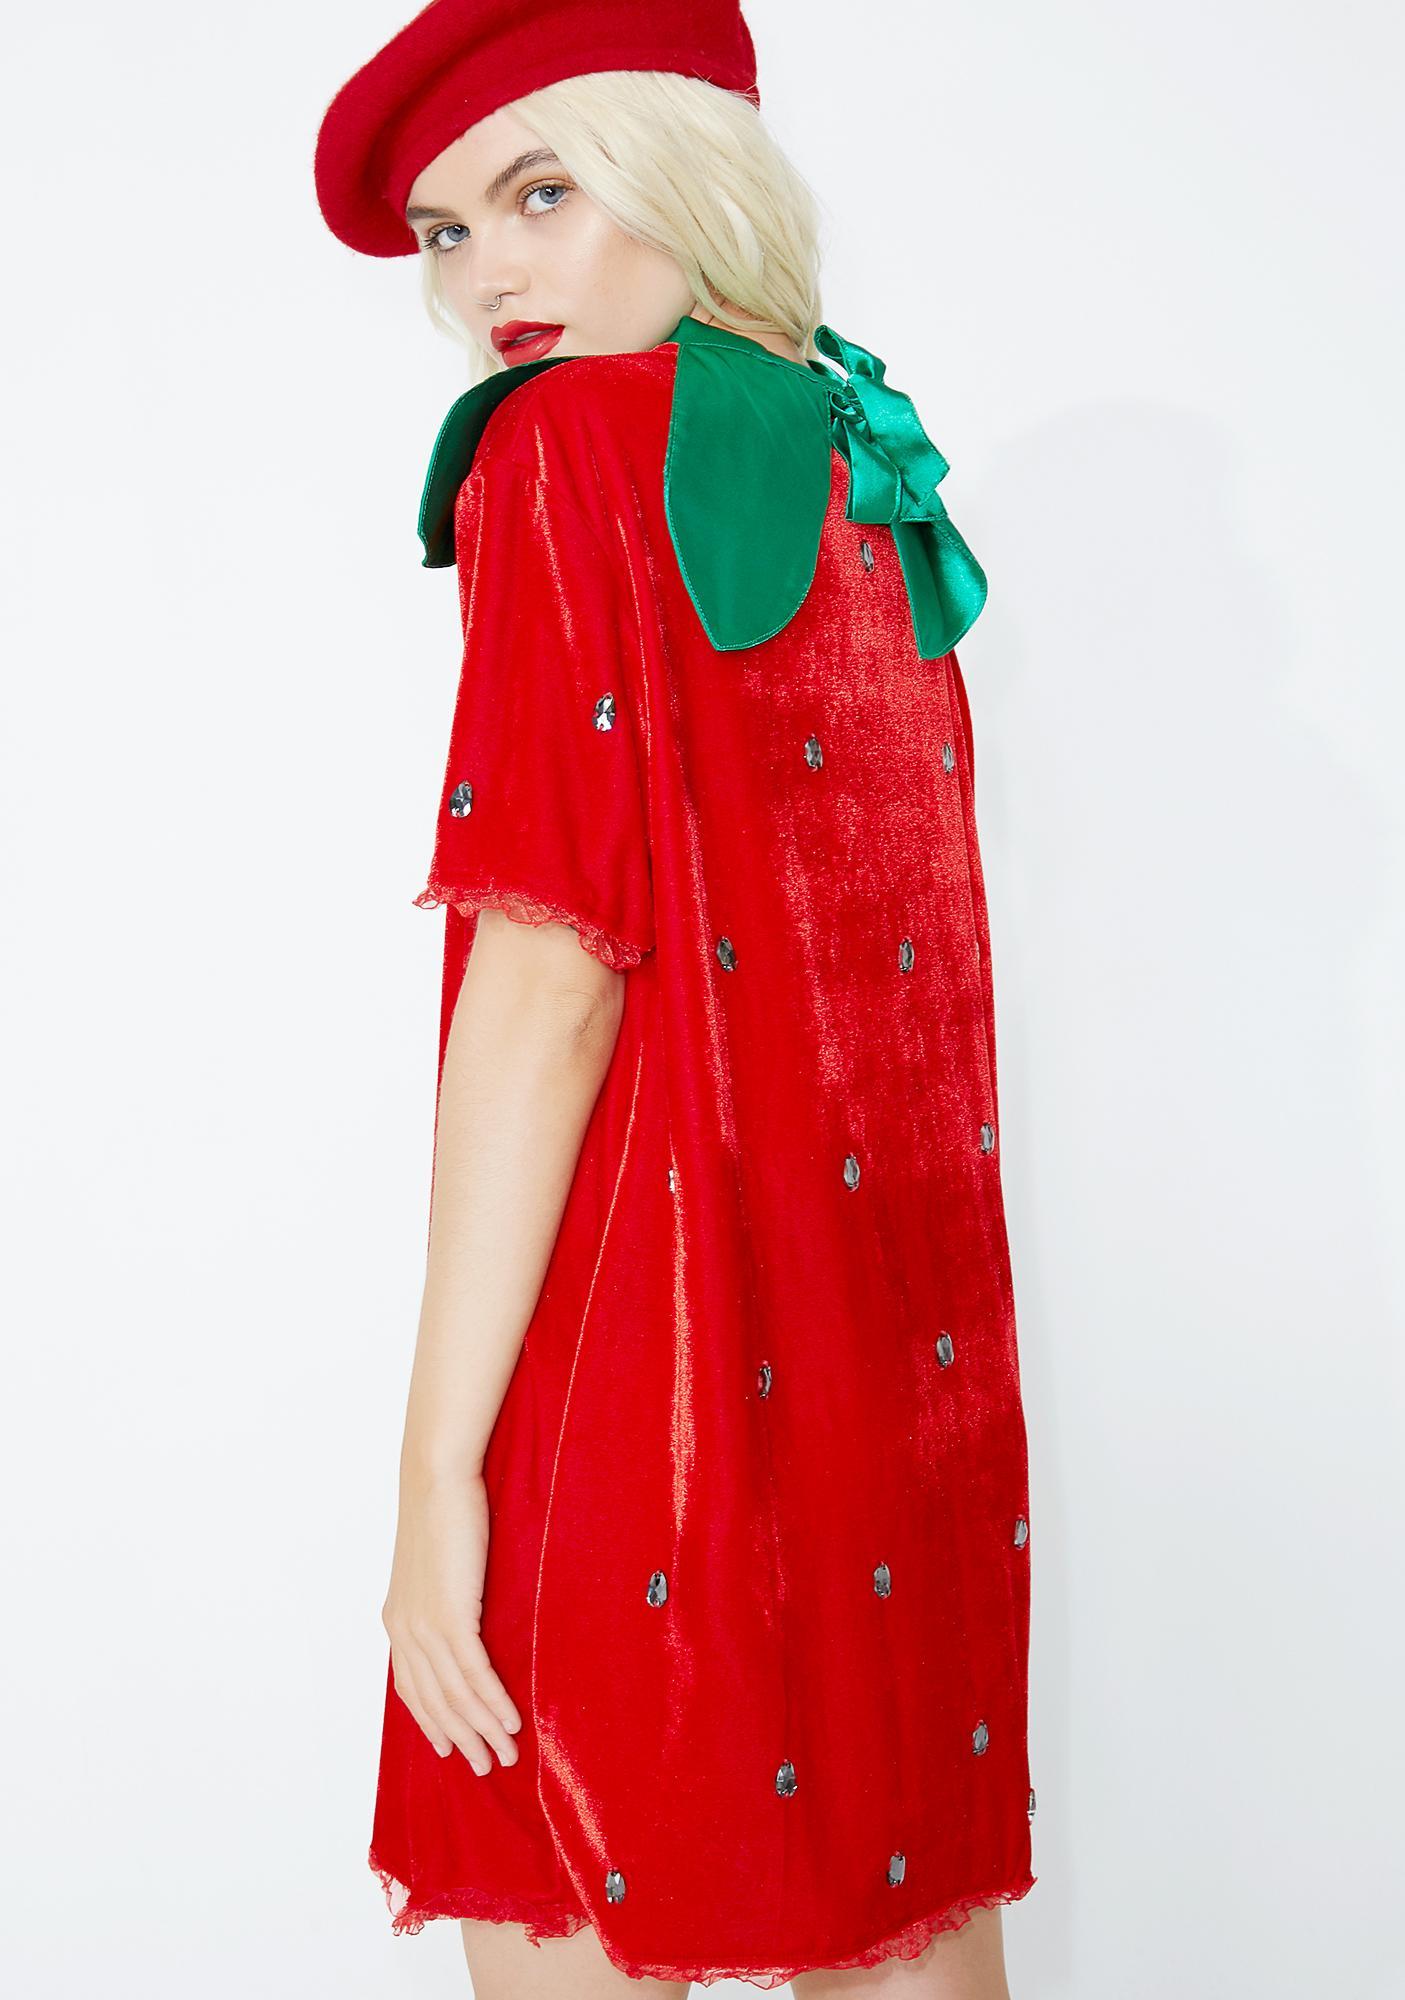 f8ffec50d30 Berry Delicious Strawberry Costume